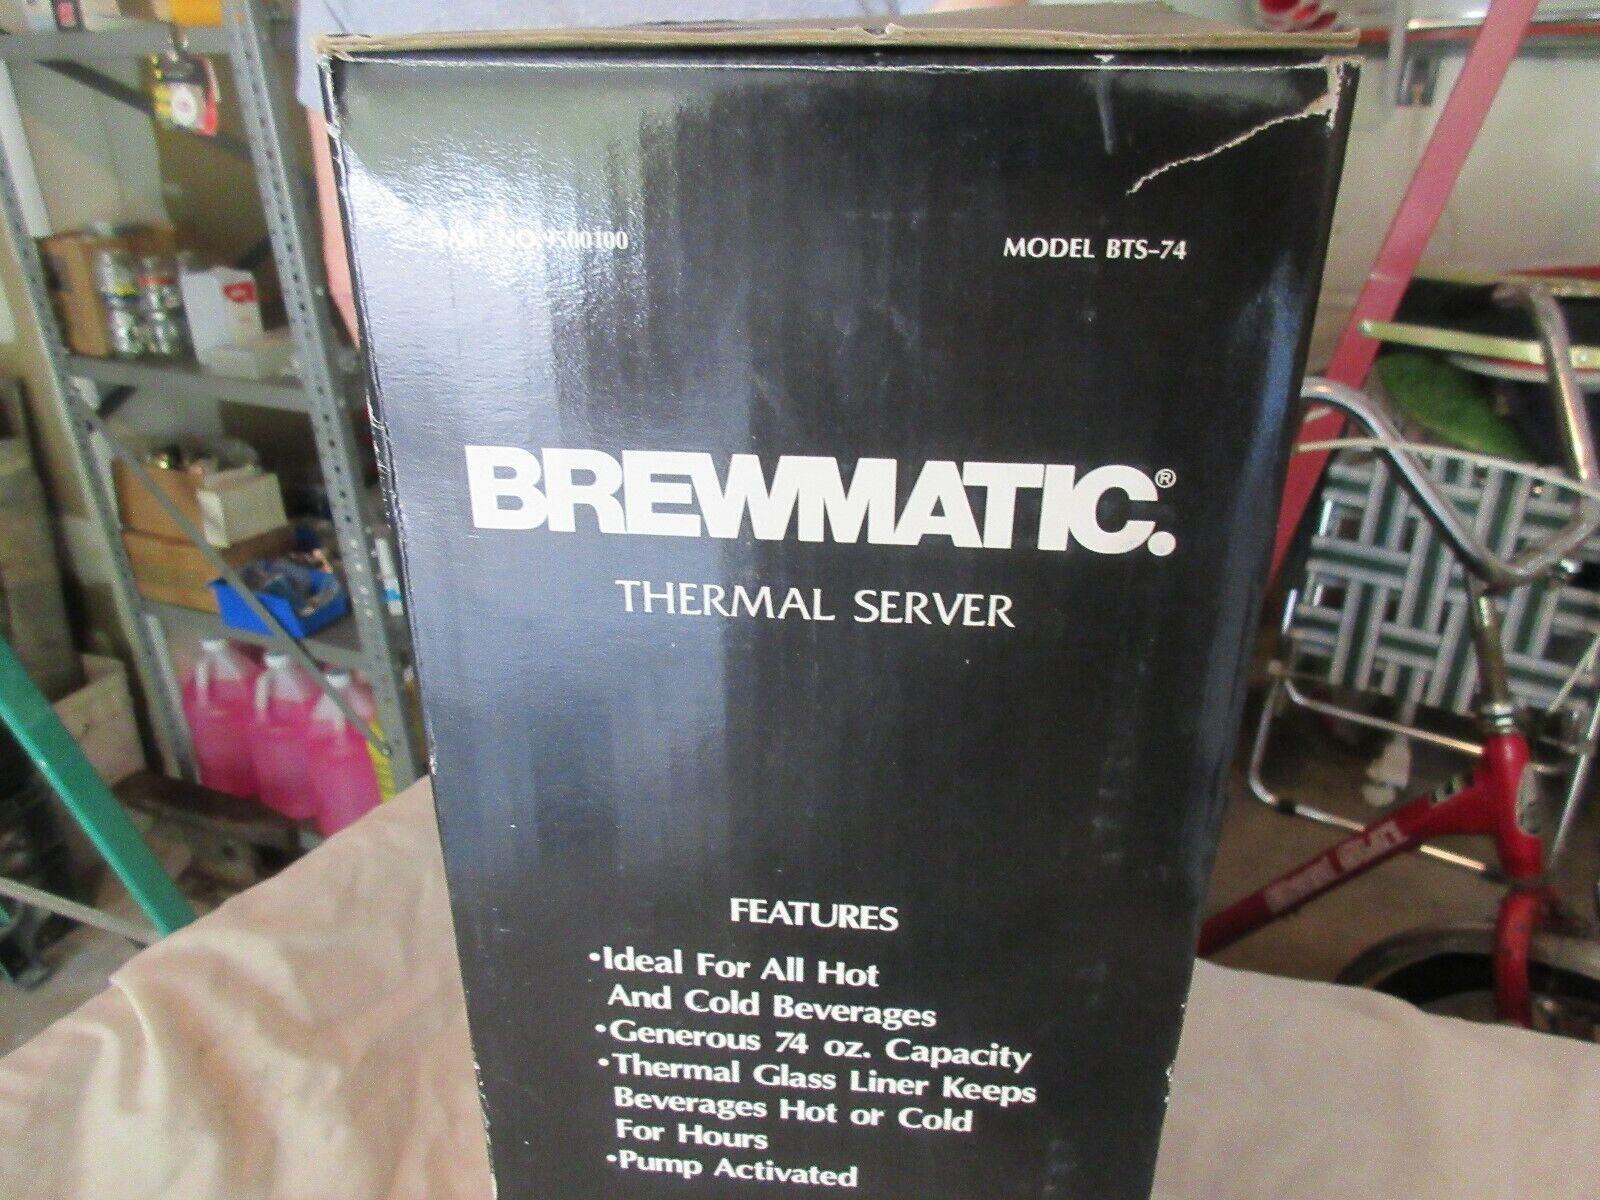 Brewmatic Thermal Server , Model BTS-74